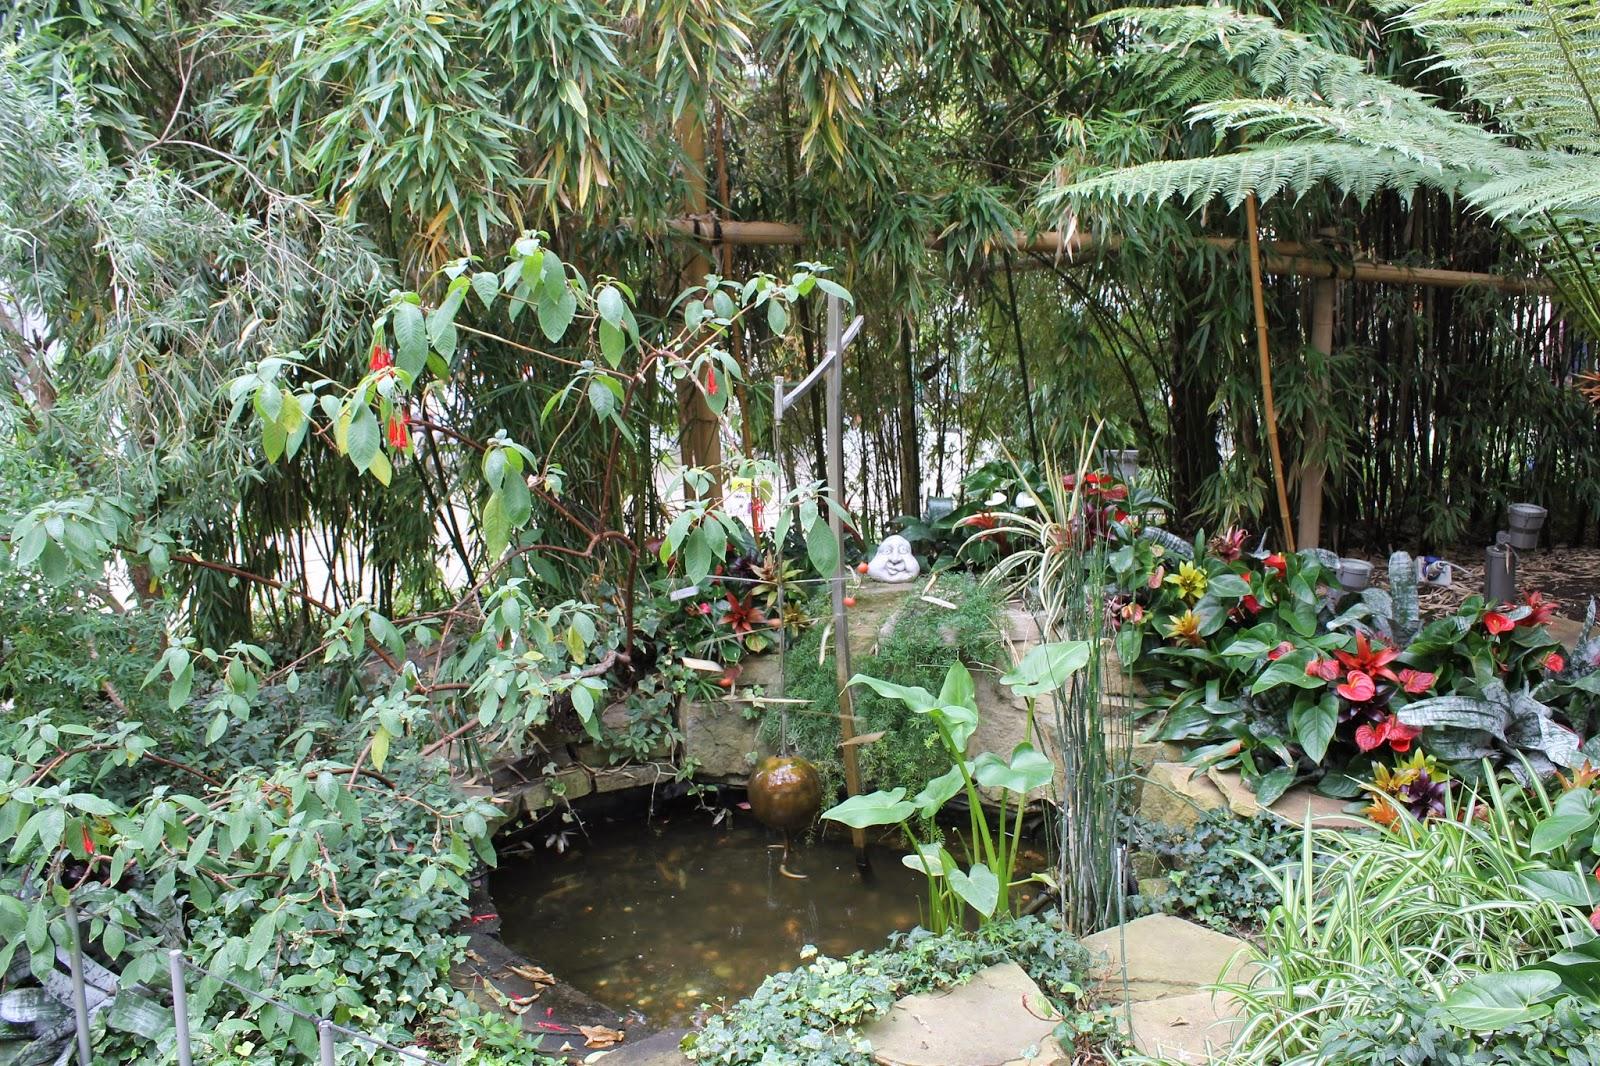 jibberjabberuk urban green spaces the winter gardens sheffield